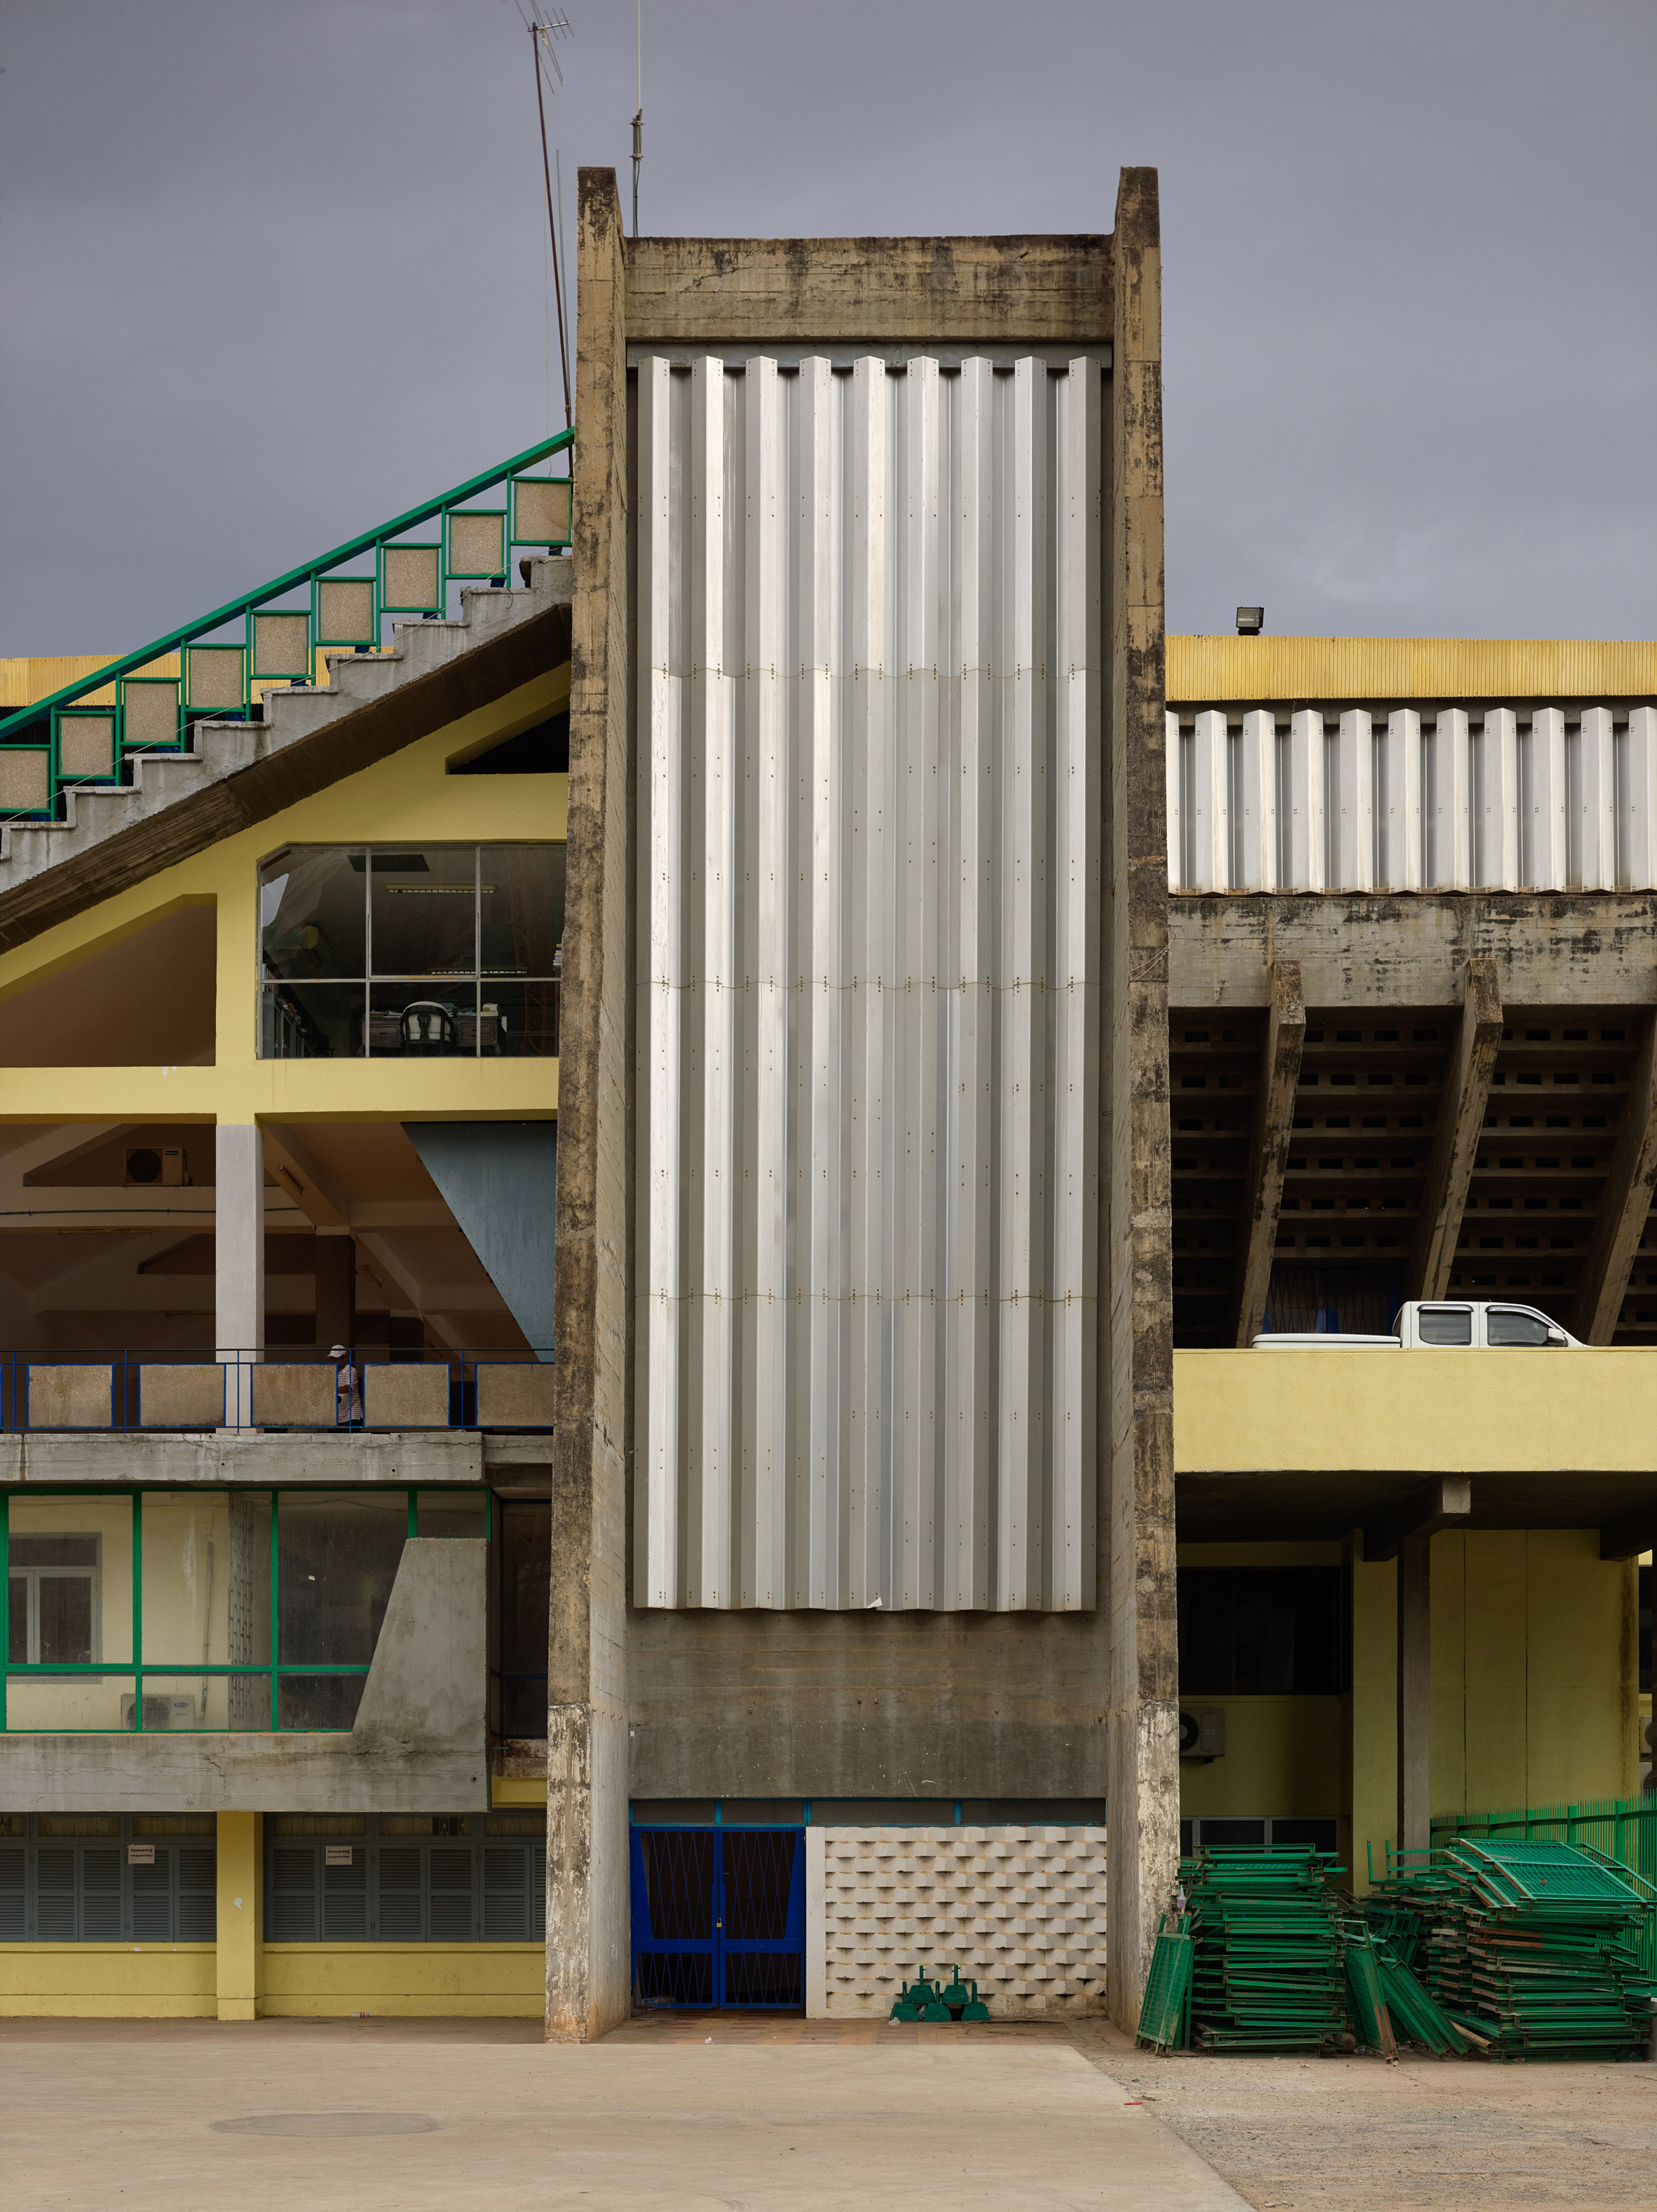 vann-molyvann-olympic-stadium-phnom-penh-cambodia-virgile-simon-bertrand-photography_dezeen_2364_col_7